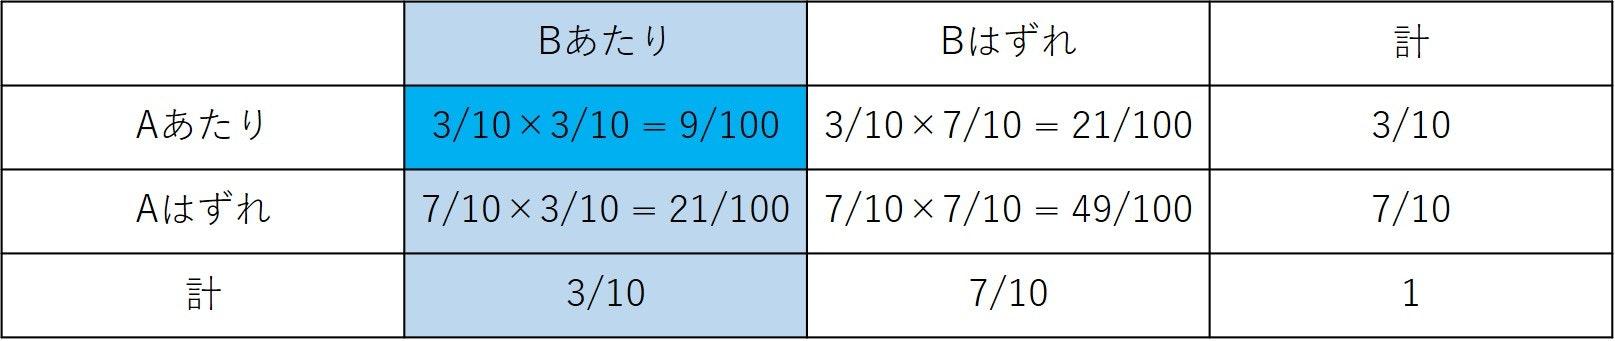 条件付き確率5.jpg